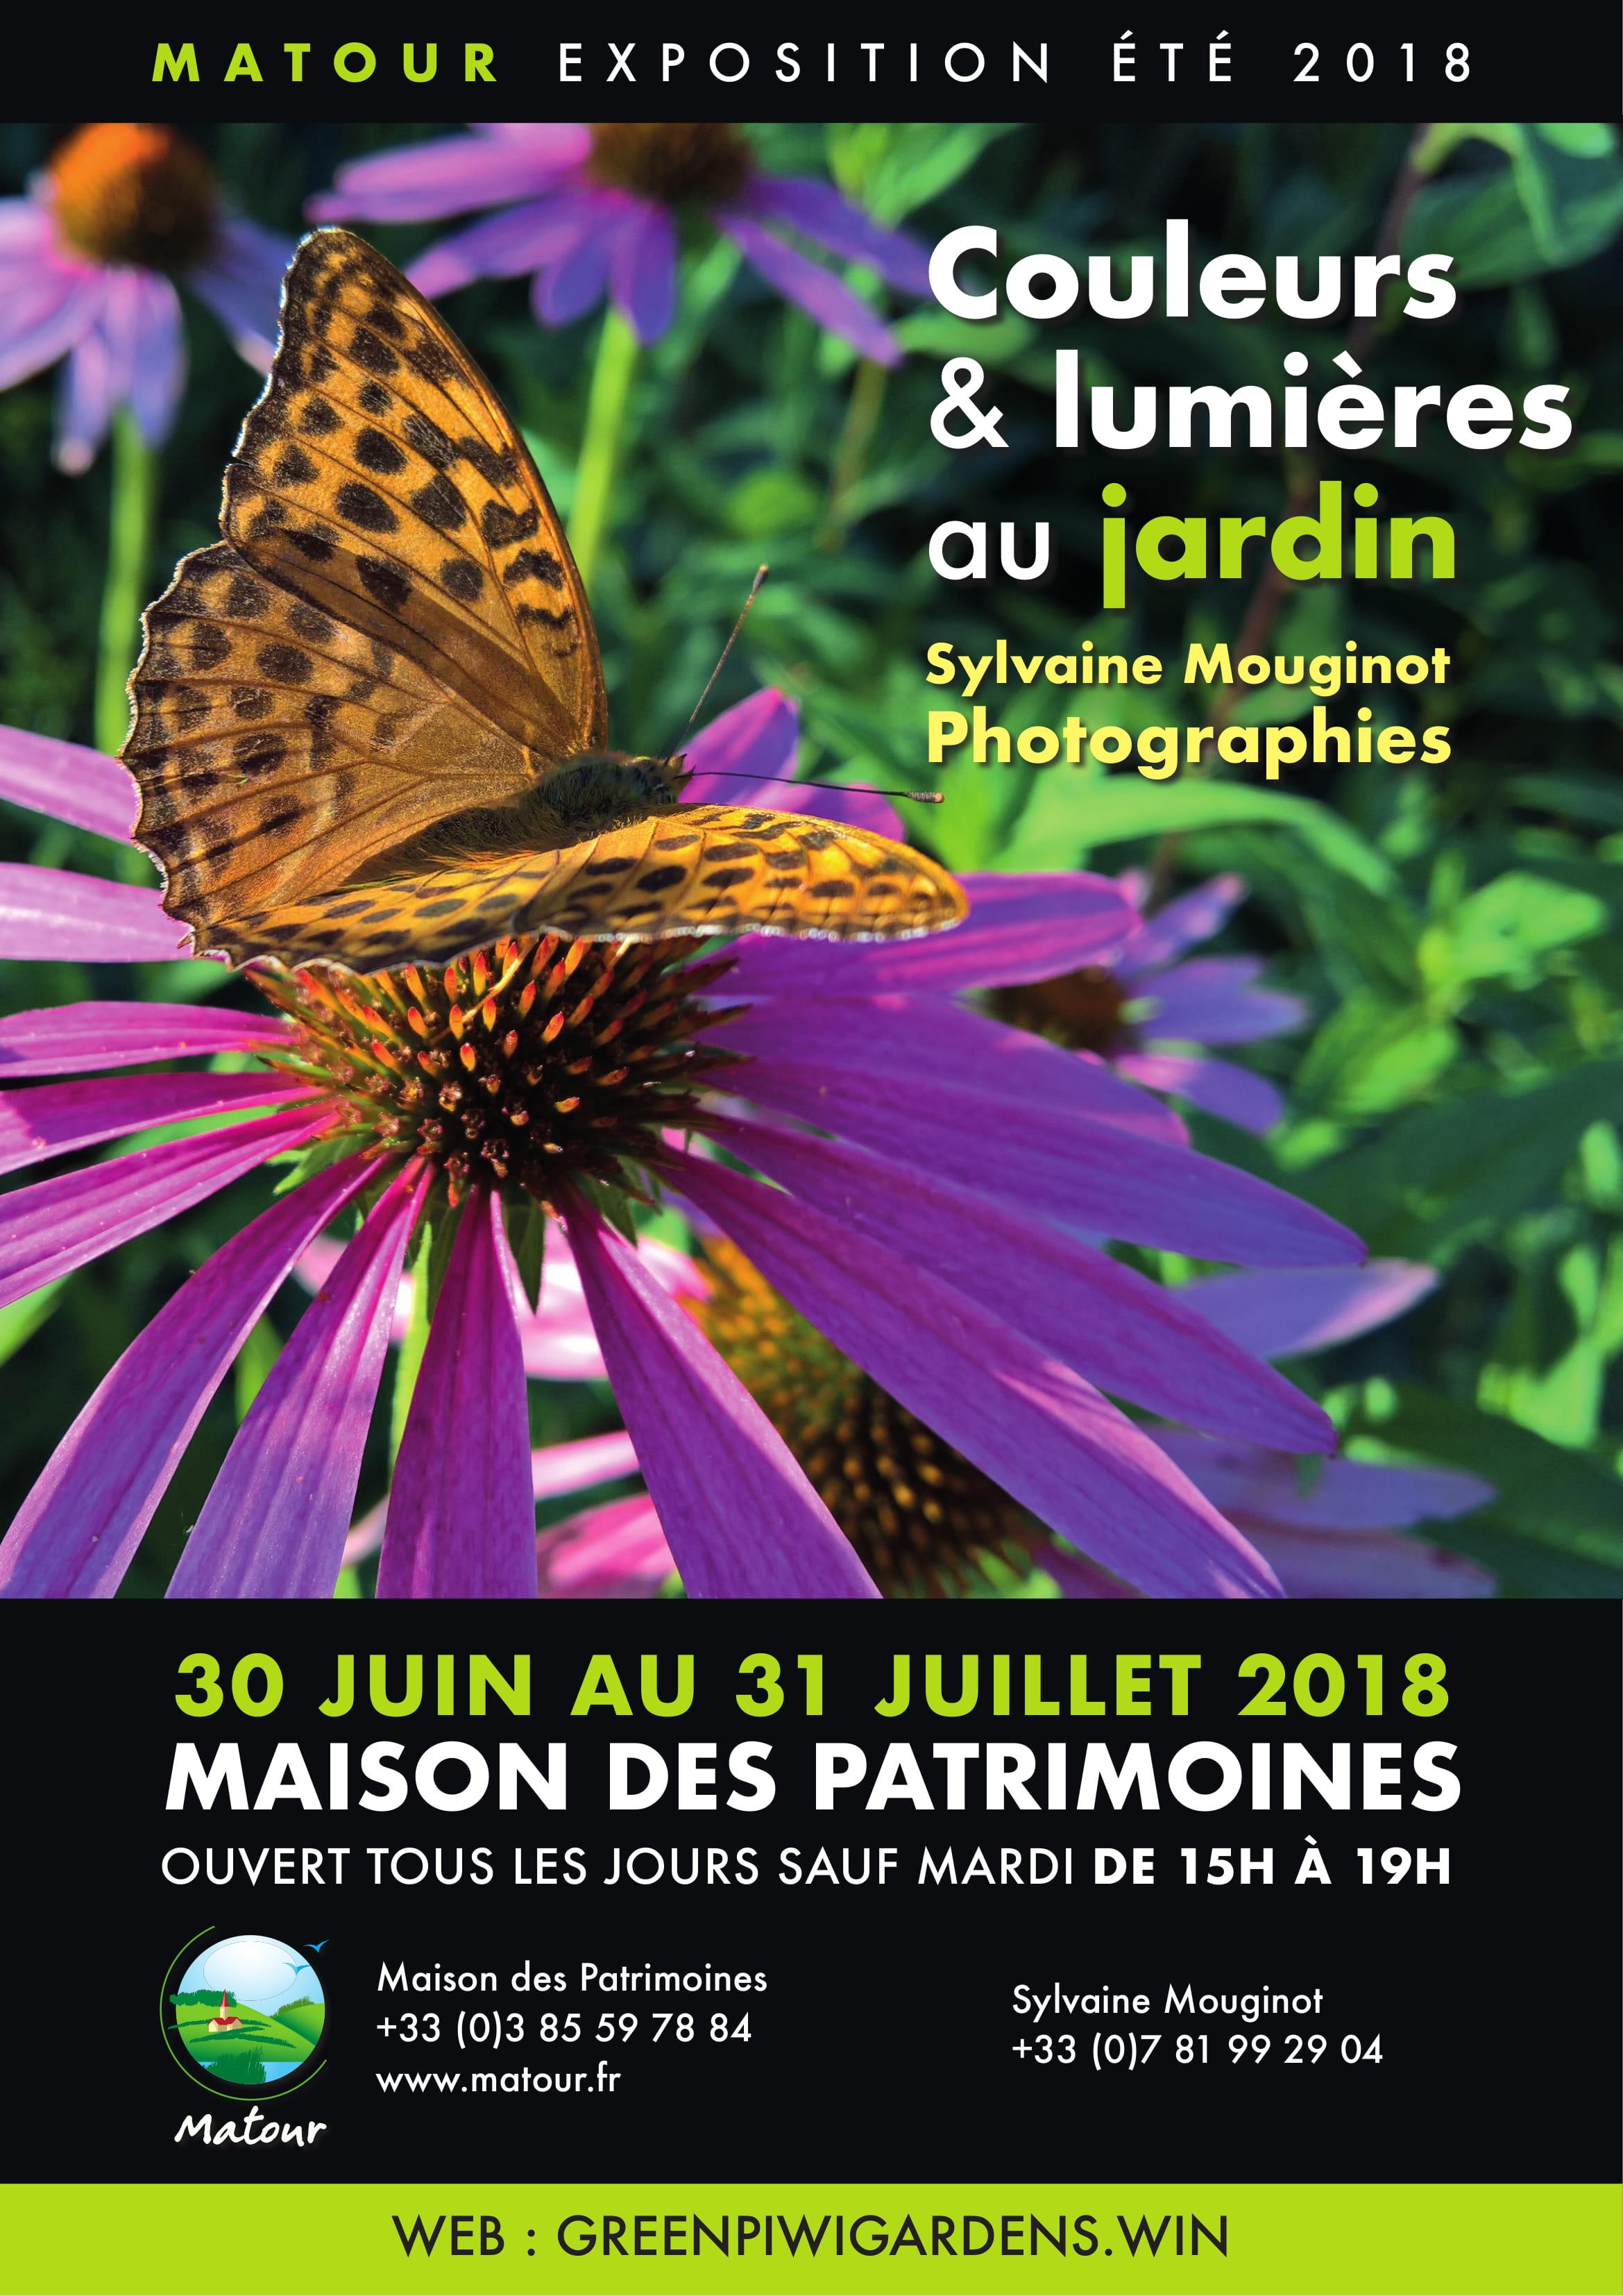 Affiche Expo Matour IBB 110618-1.jpg